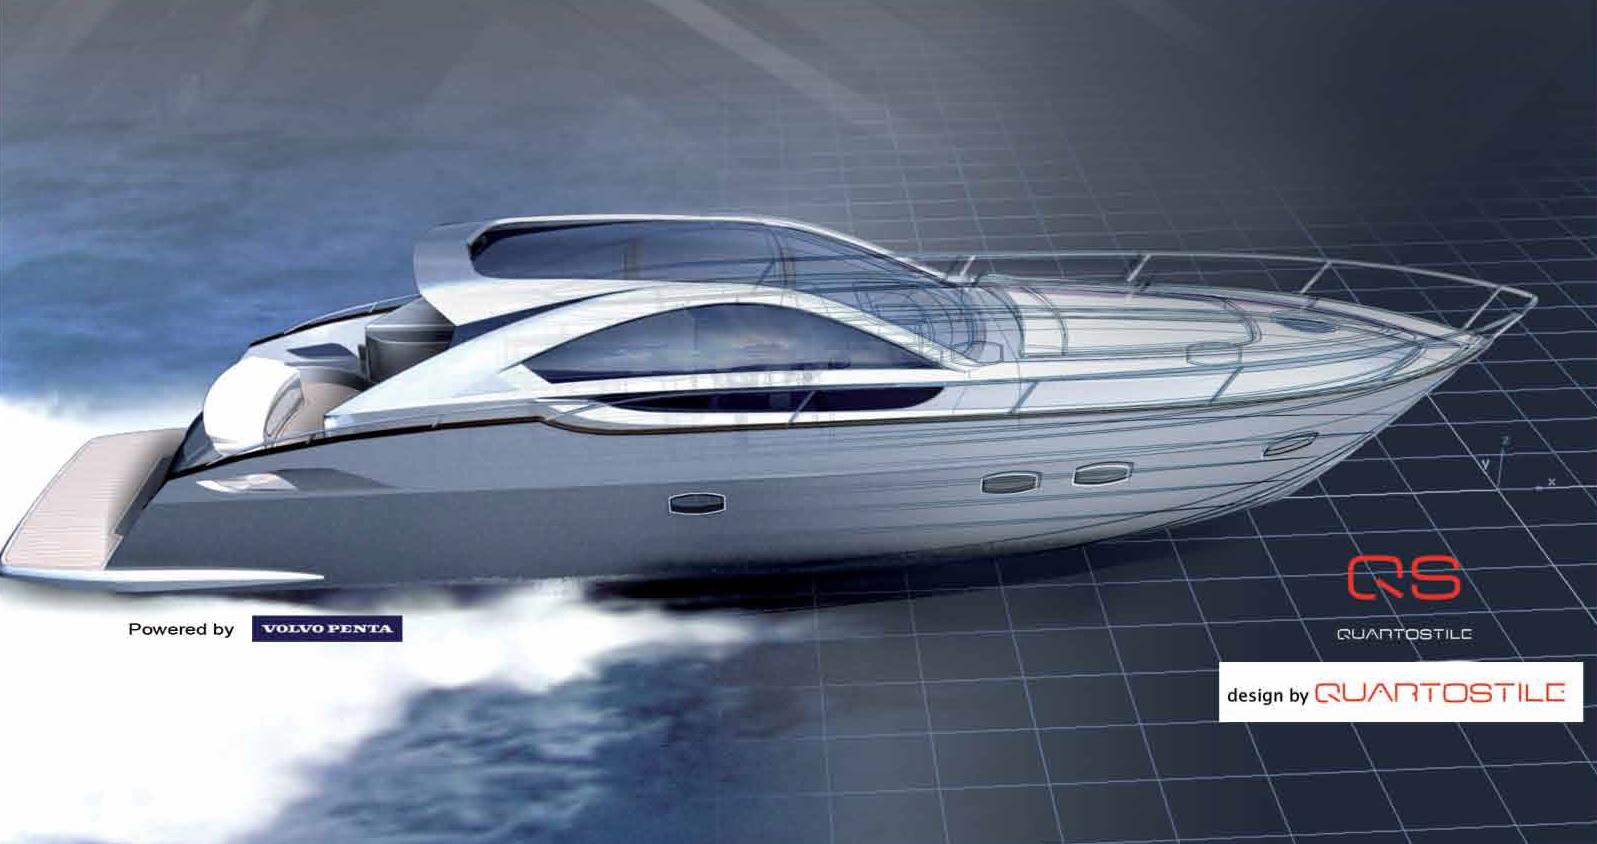 Pearlsea Yachts - Premium Croatian motor yacht manufacturer